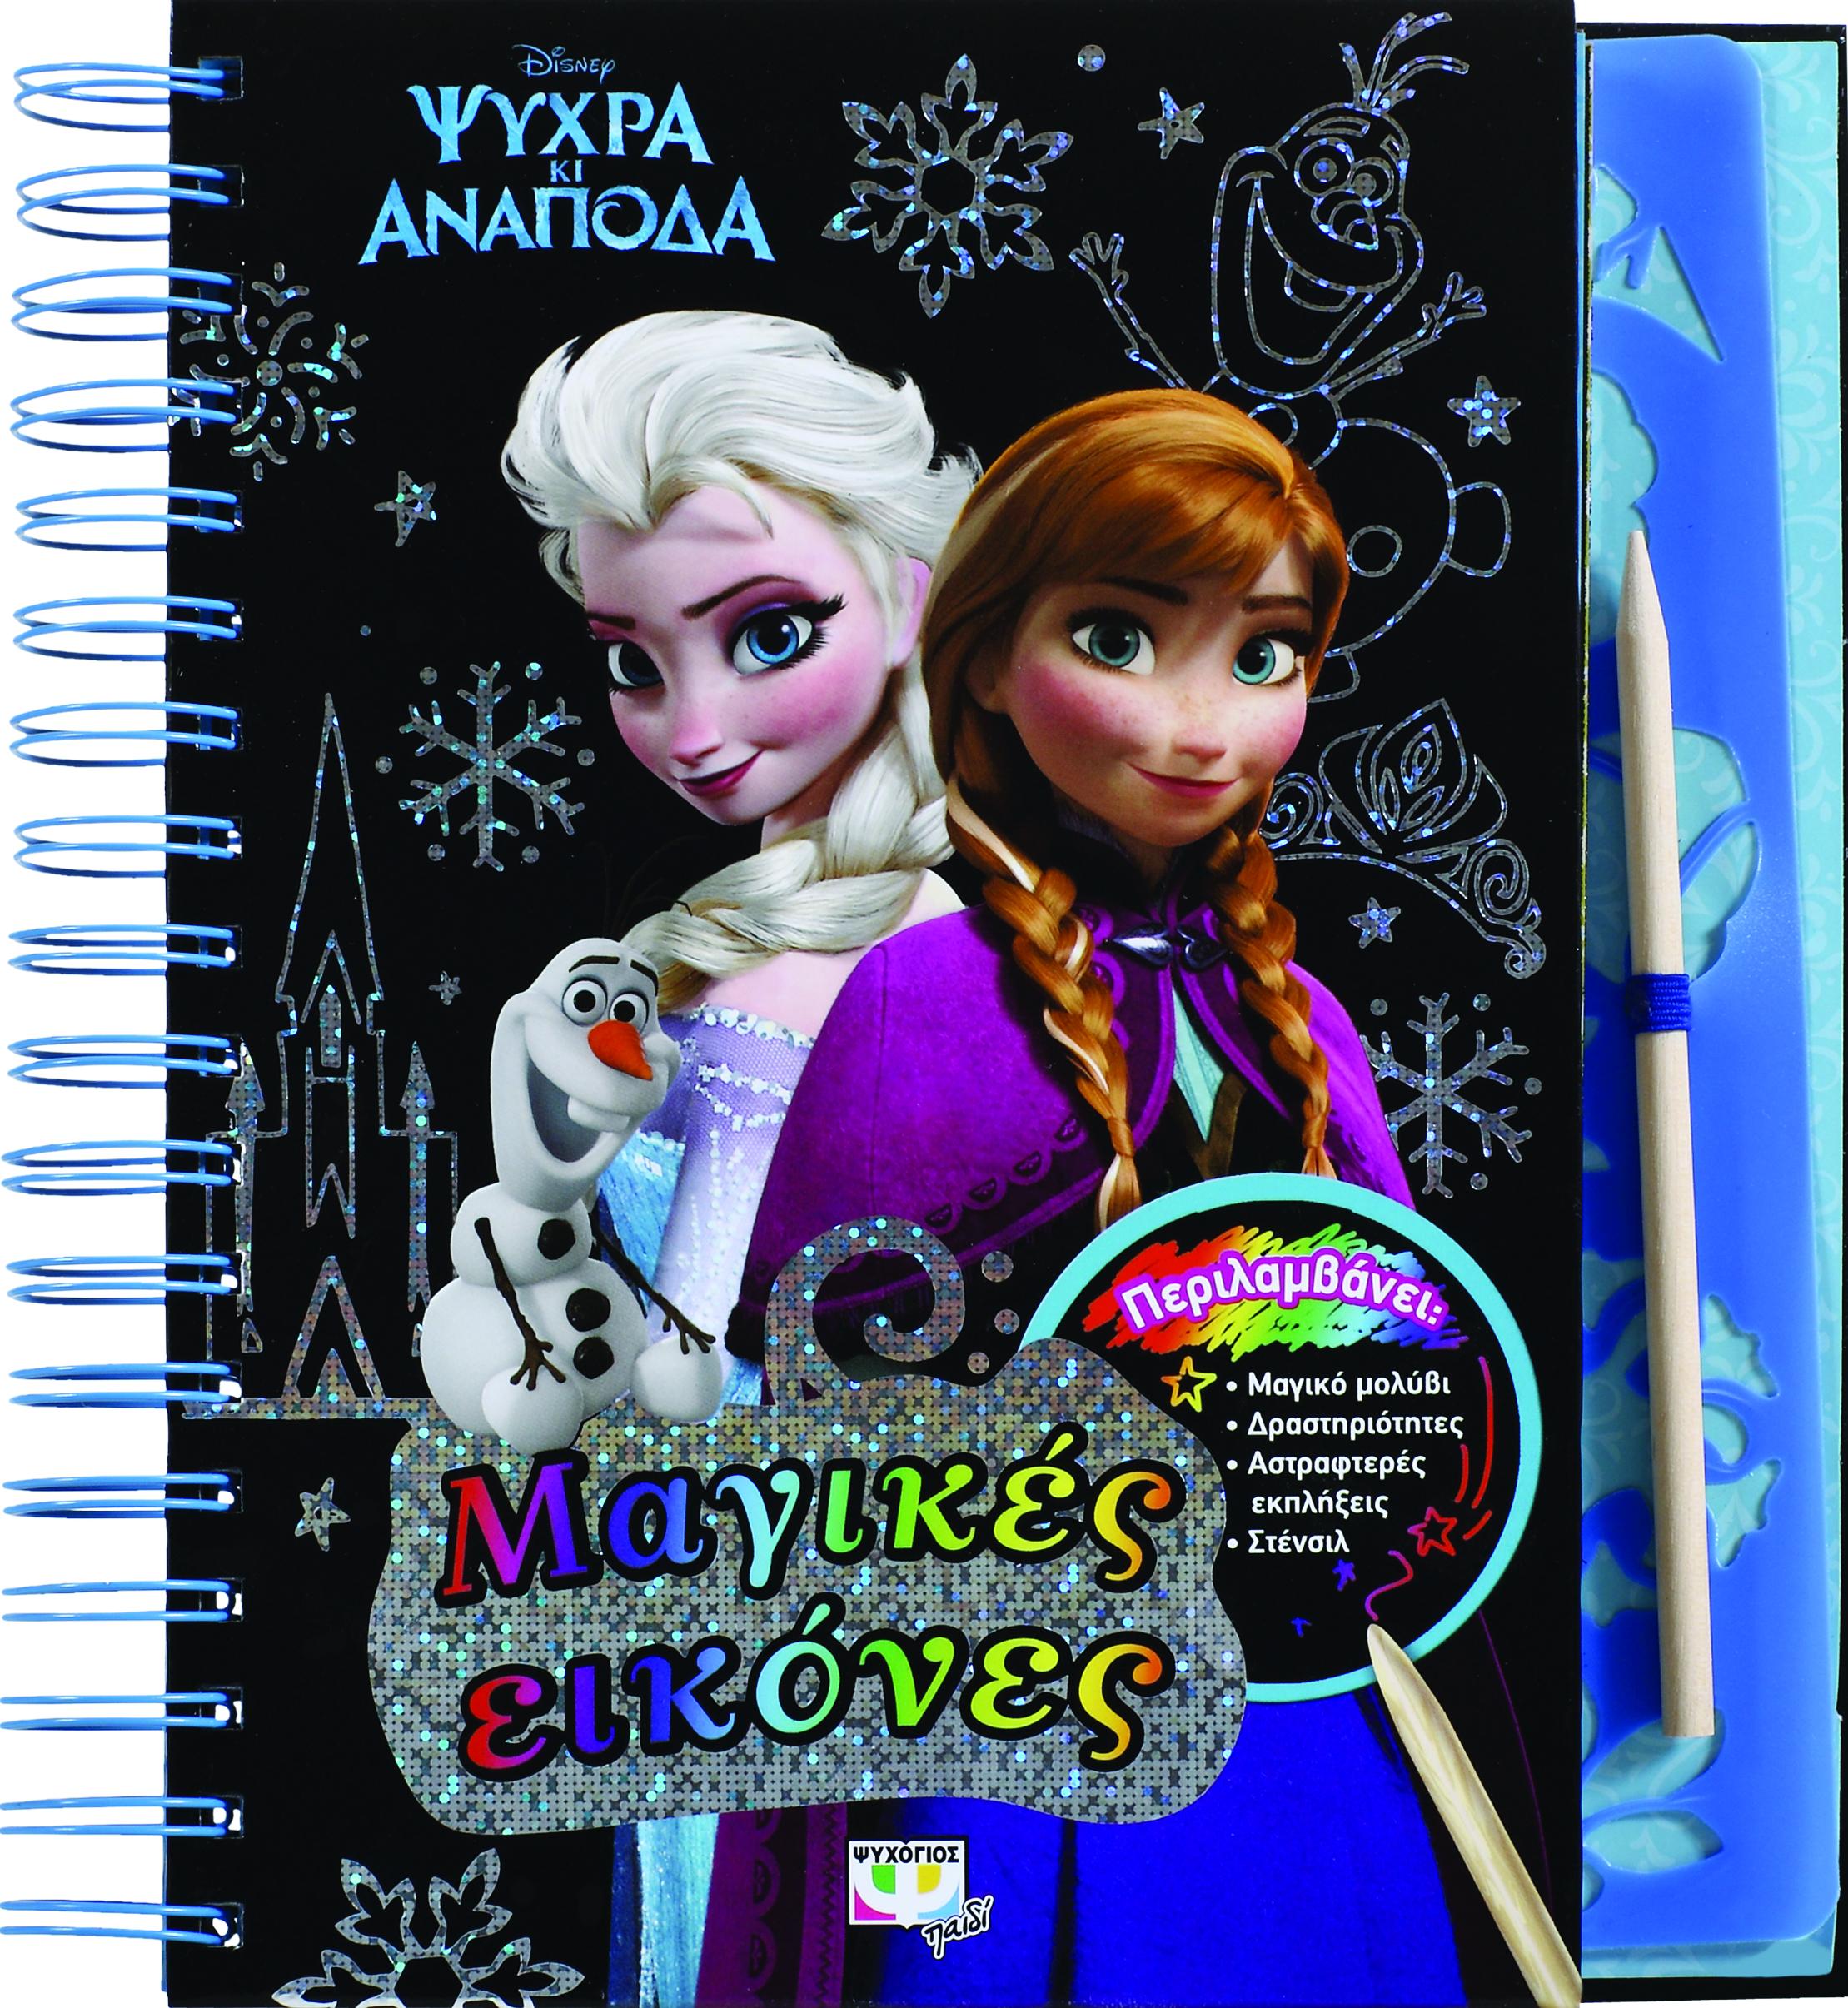 Disney Ψυχρά Και Ανάποδα Μαγικές Εικόνες bibliopoleio biblia paidika